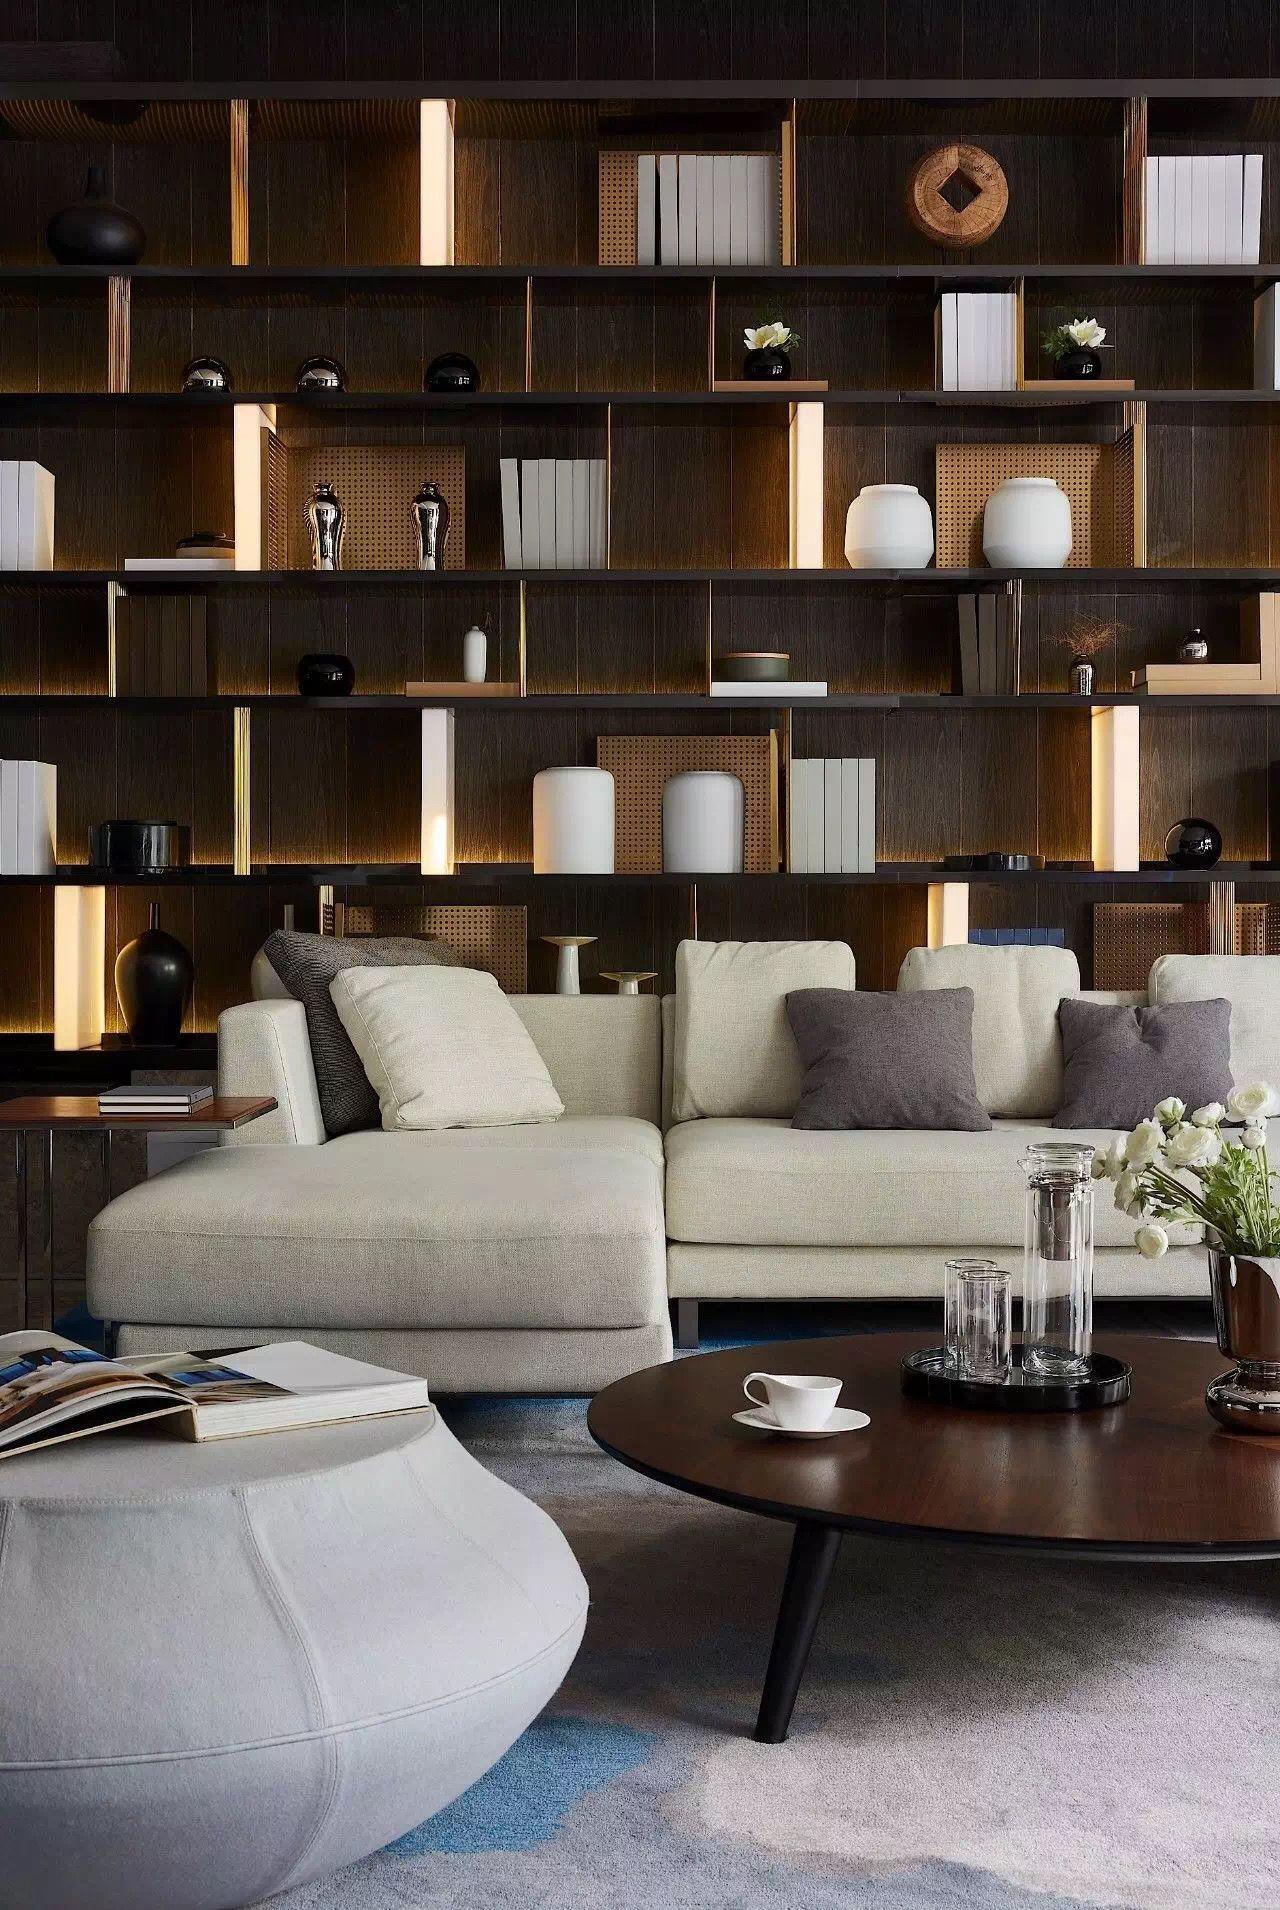 Rooms By Design Furniture Store: Living Room Interior, Interior